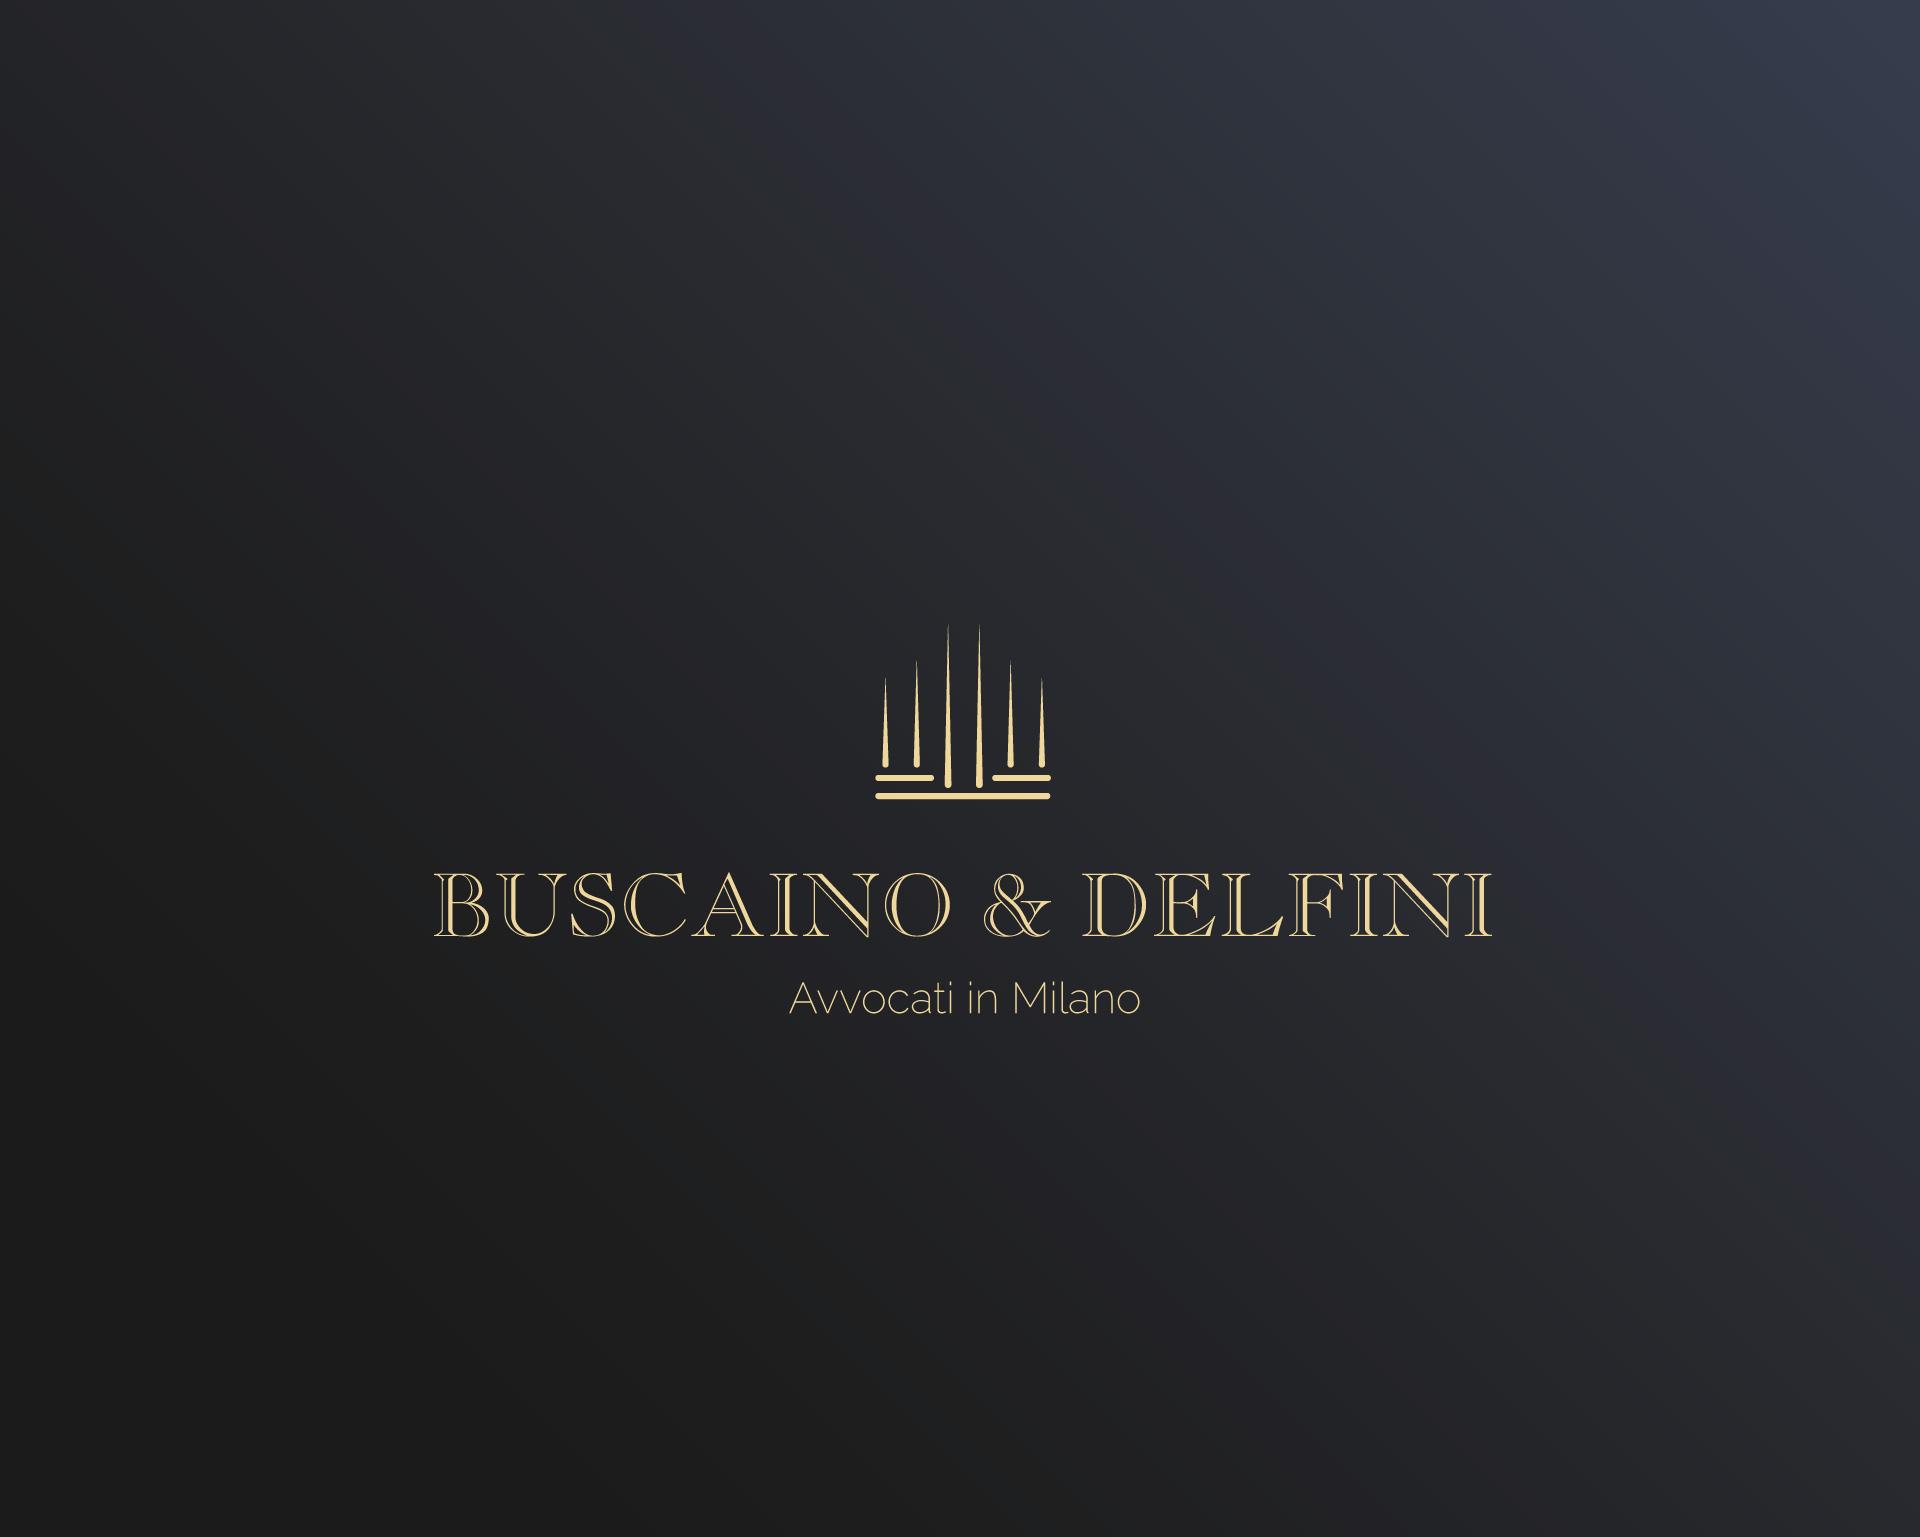 buscaino & delfini moodmama sito brochure web branding rebranding logo